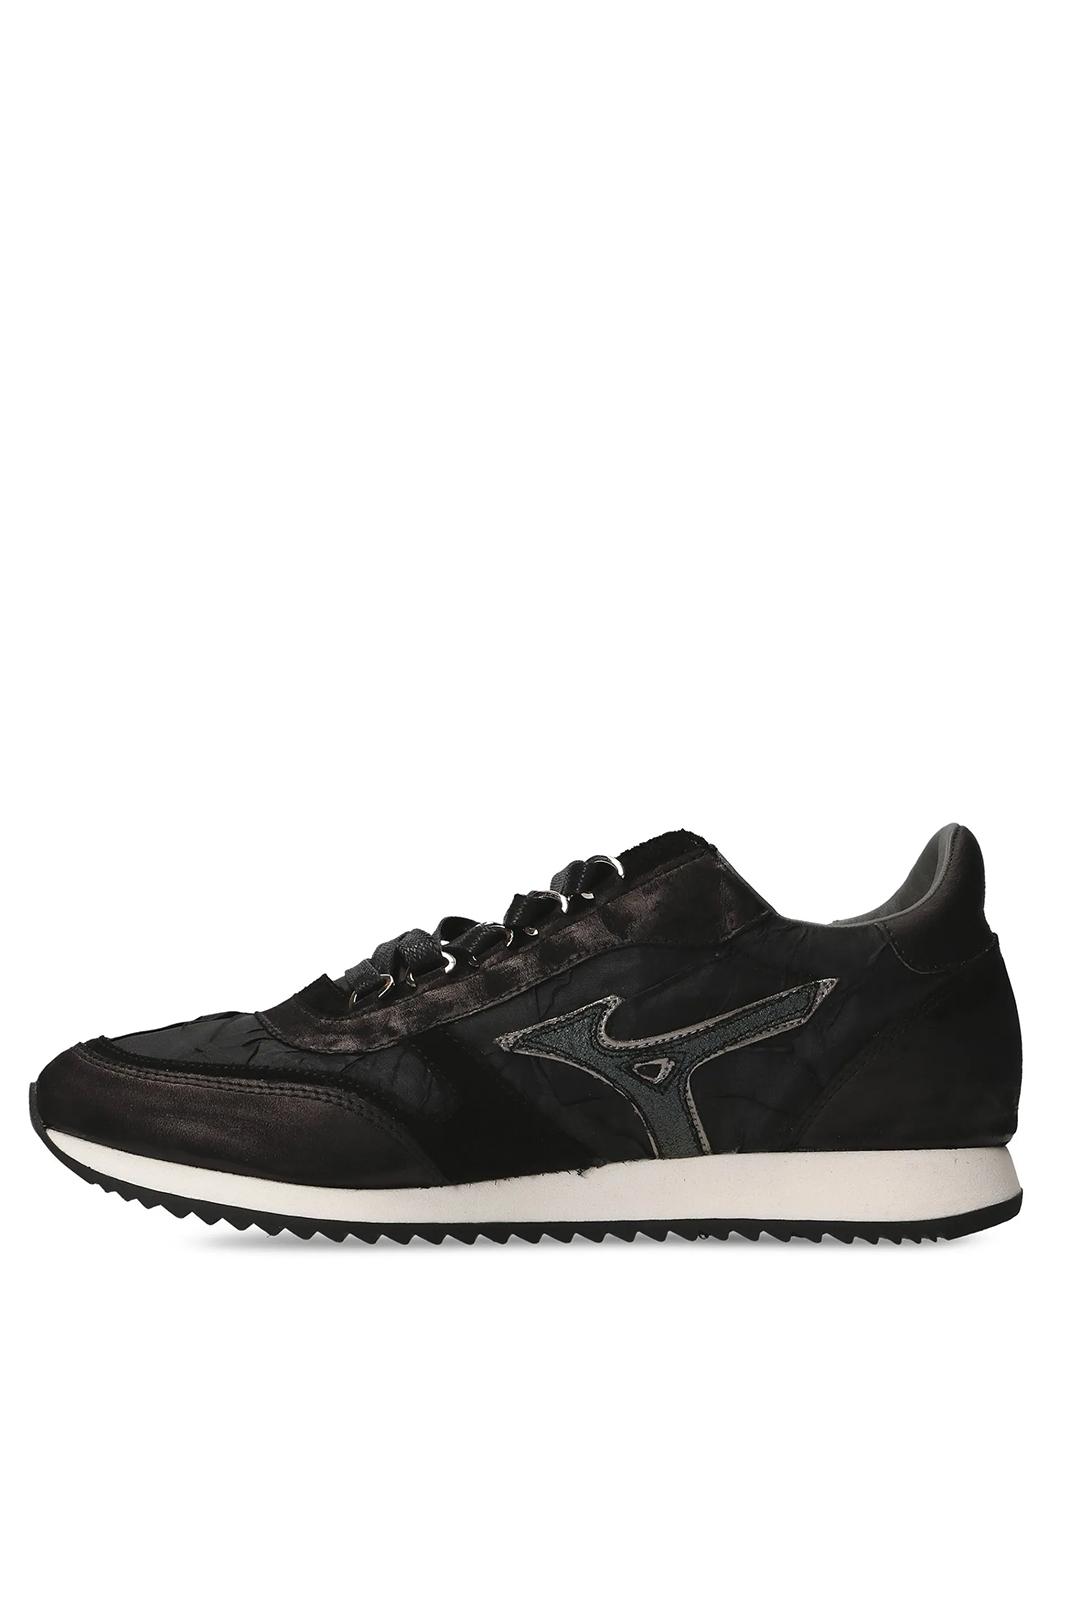 Chaussures   Mizuno D1GE180609 NAOS 2 BLACK/DARK SILVER/BL